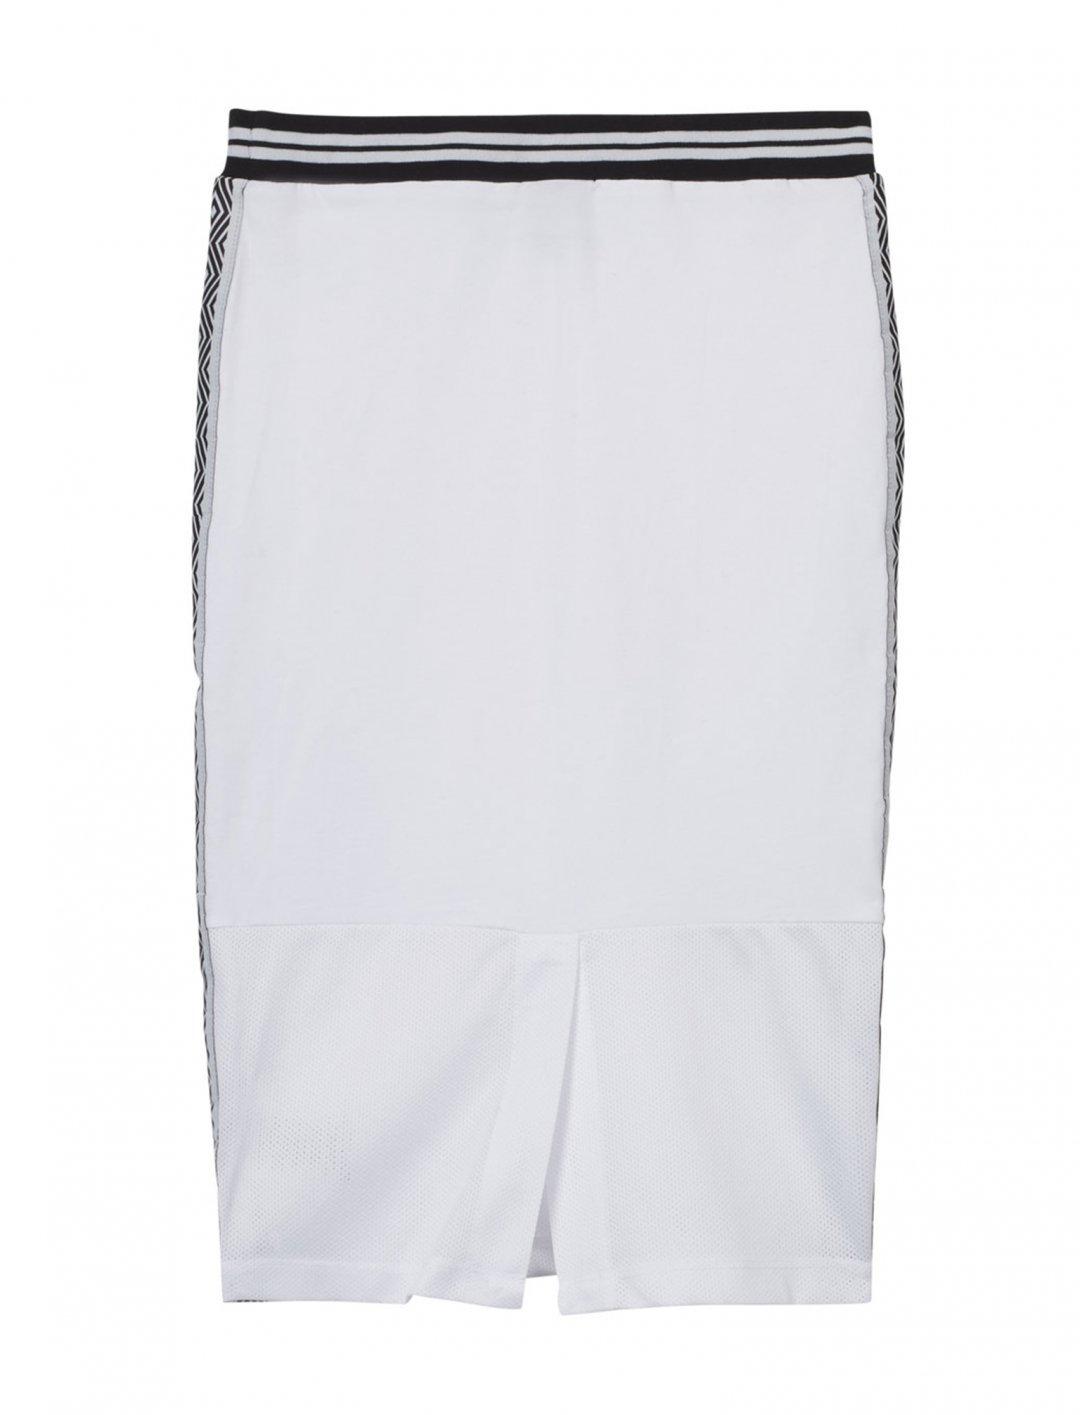 "Au/Ra's Mesh Hem Skirt {""id"":5,""product_section_id"":1,""name"":""Clothing"",""order"":5} Umbro"